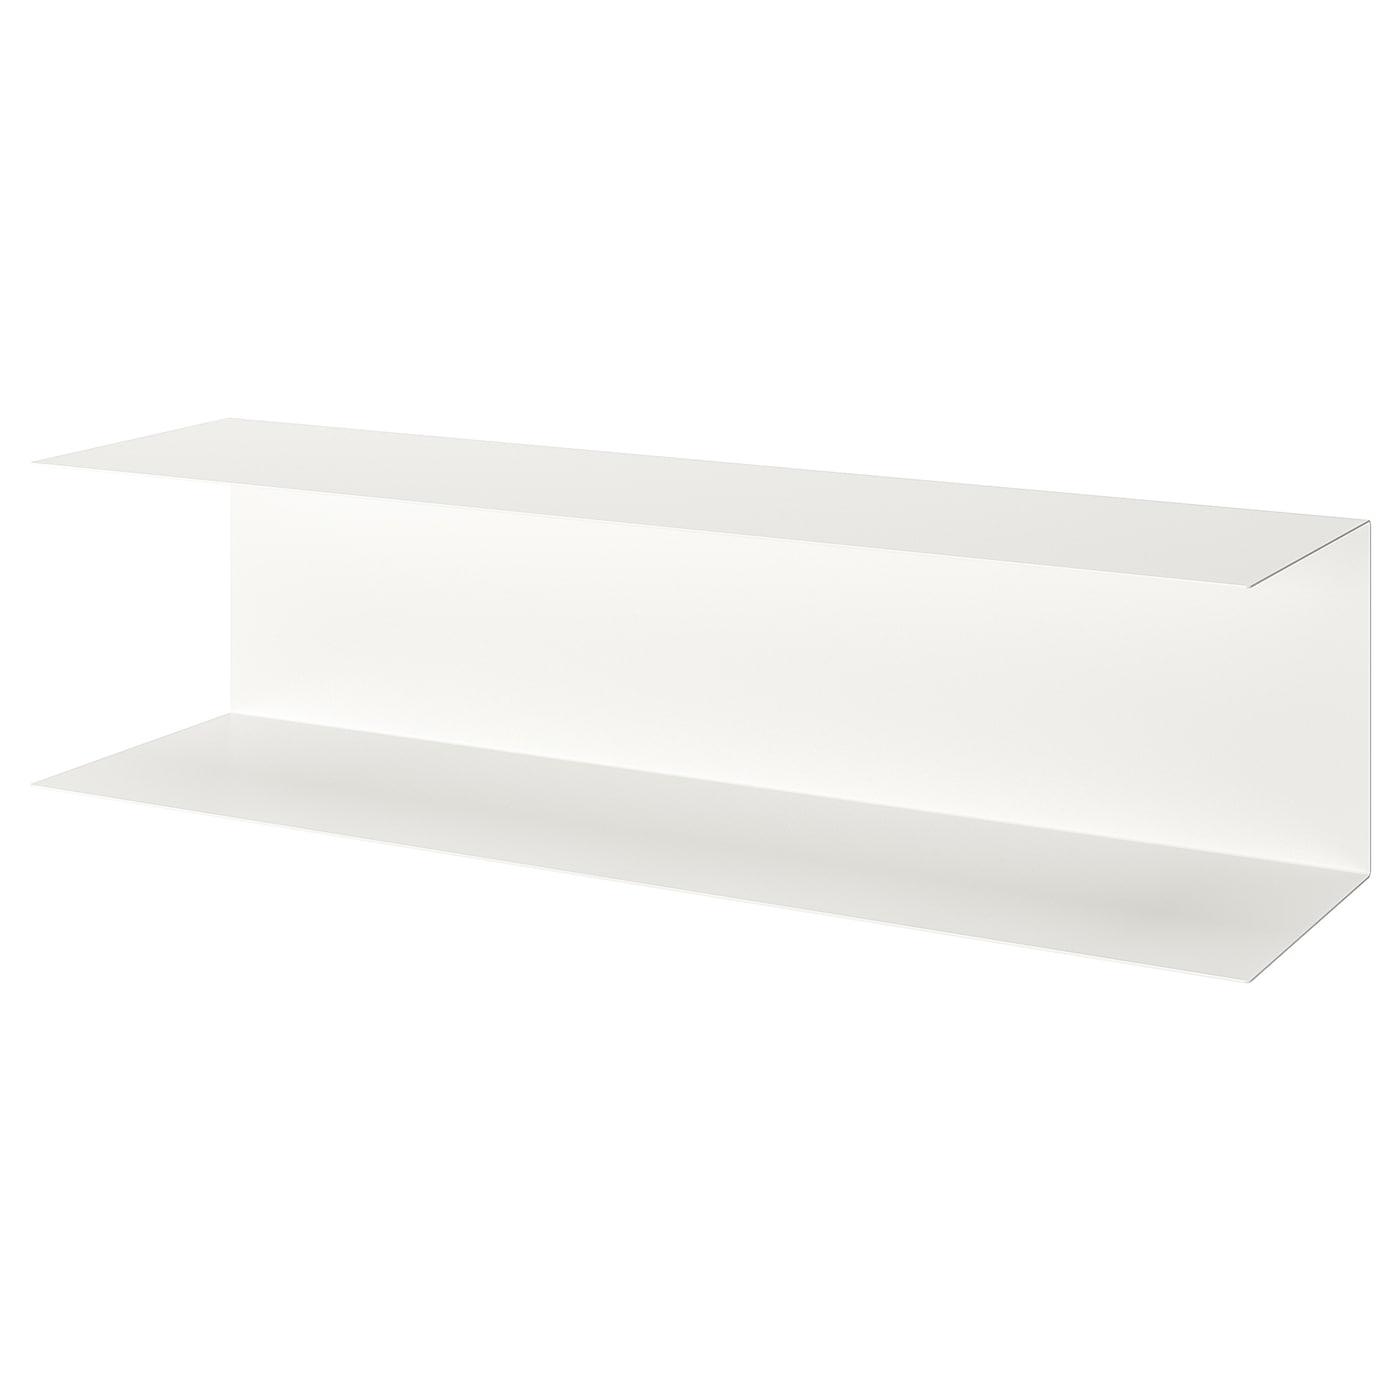 Botkyrka Wandregal Weiss Ikea Schweiz